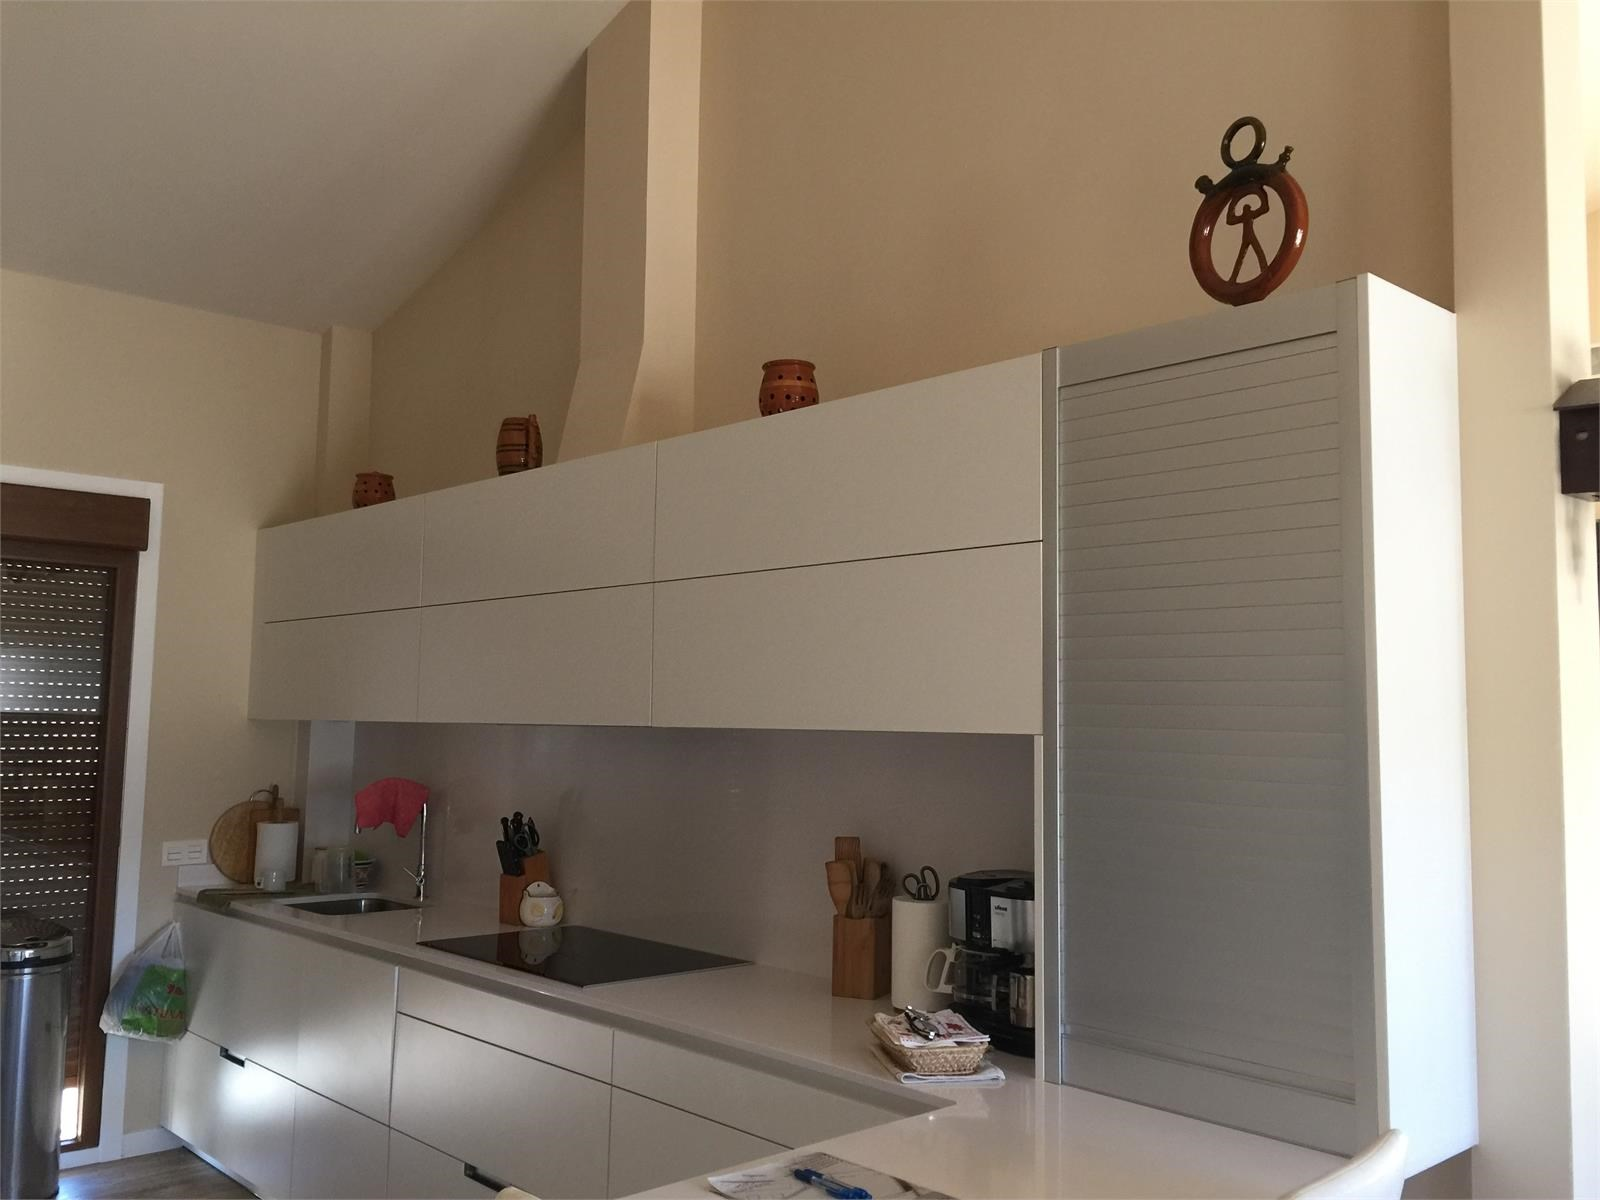 cocina_img73005PICt3m0